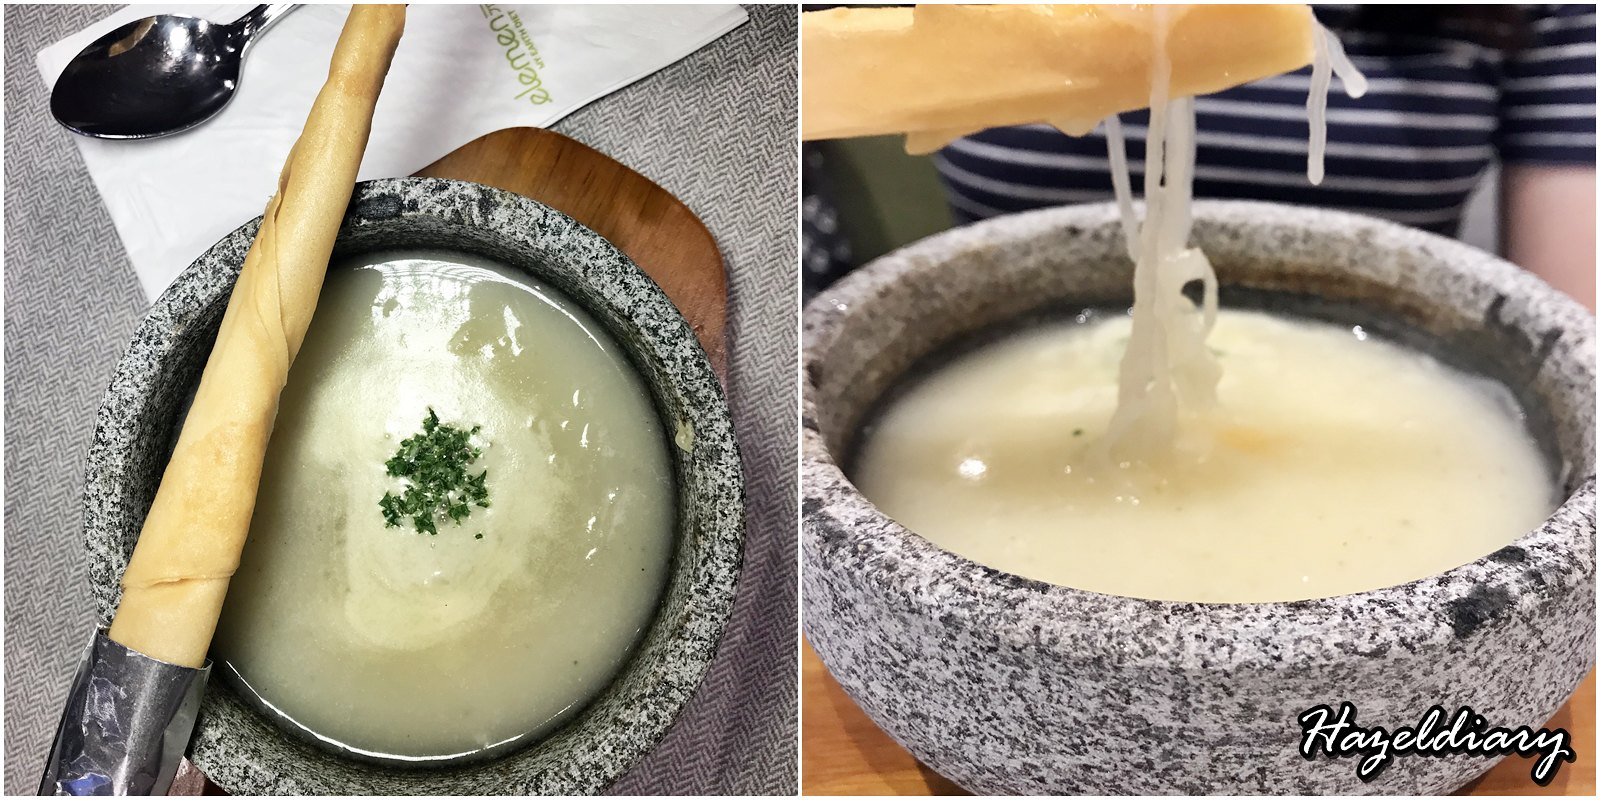 Elemen Trufflelicious- Braised Melon Soup